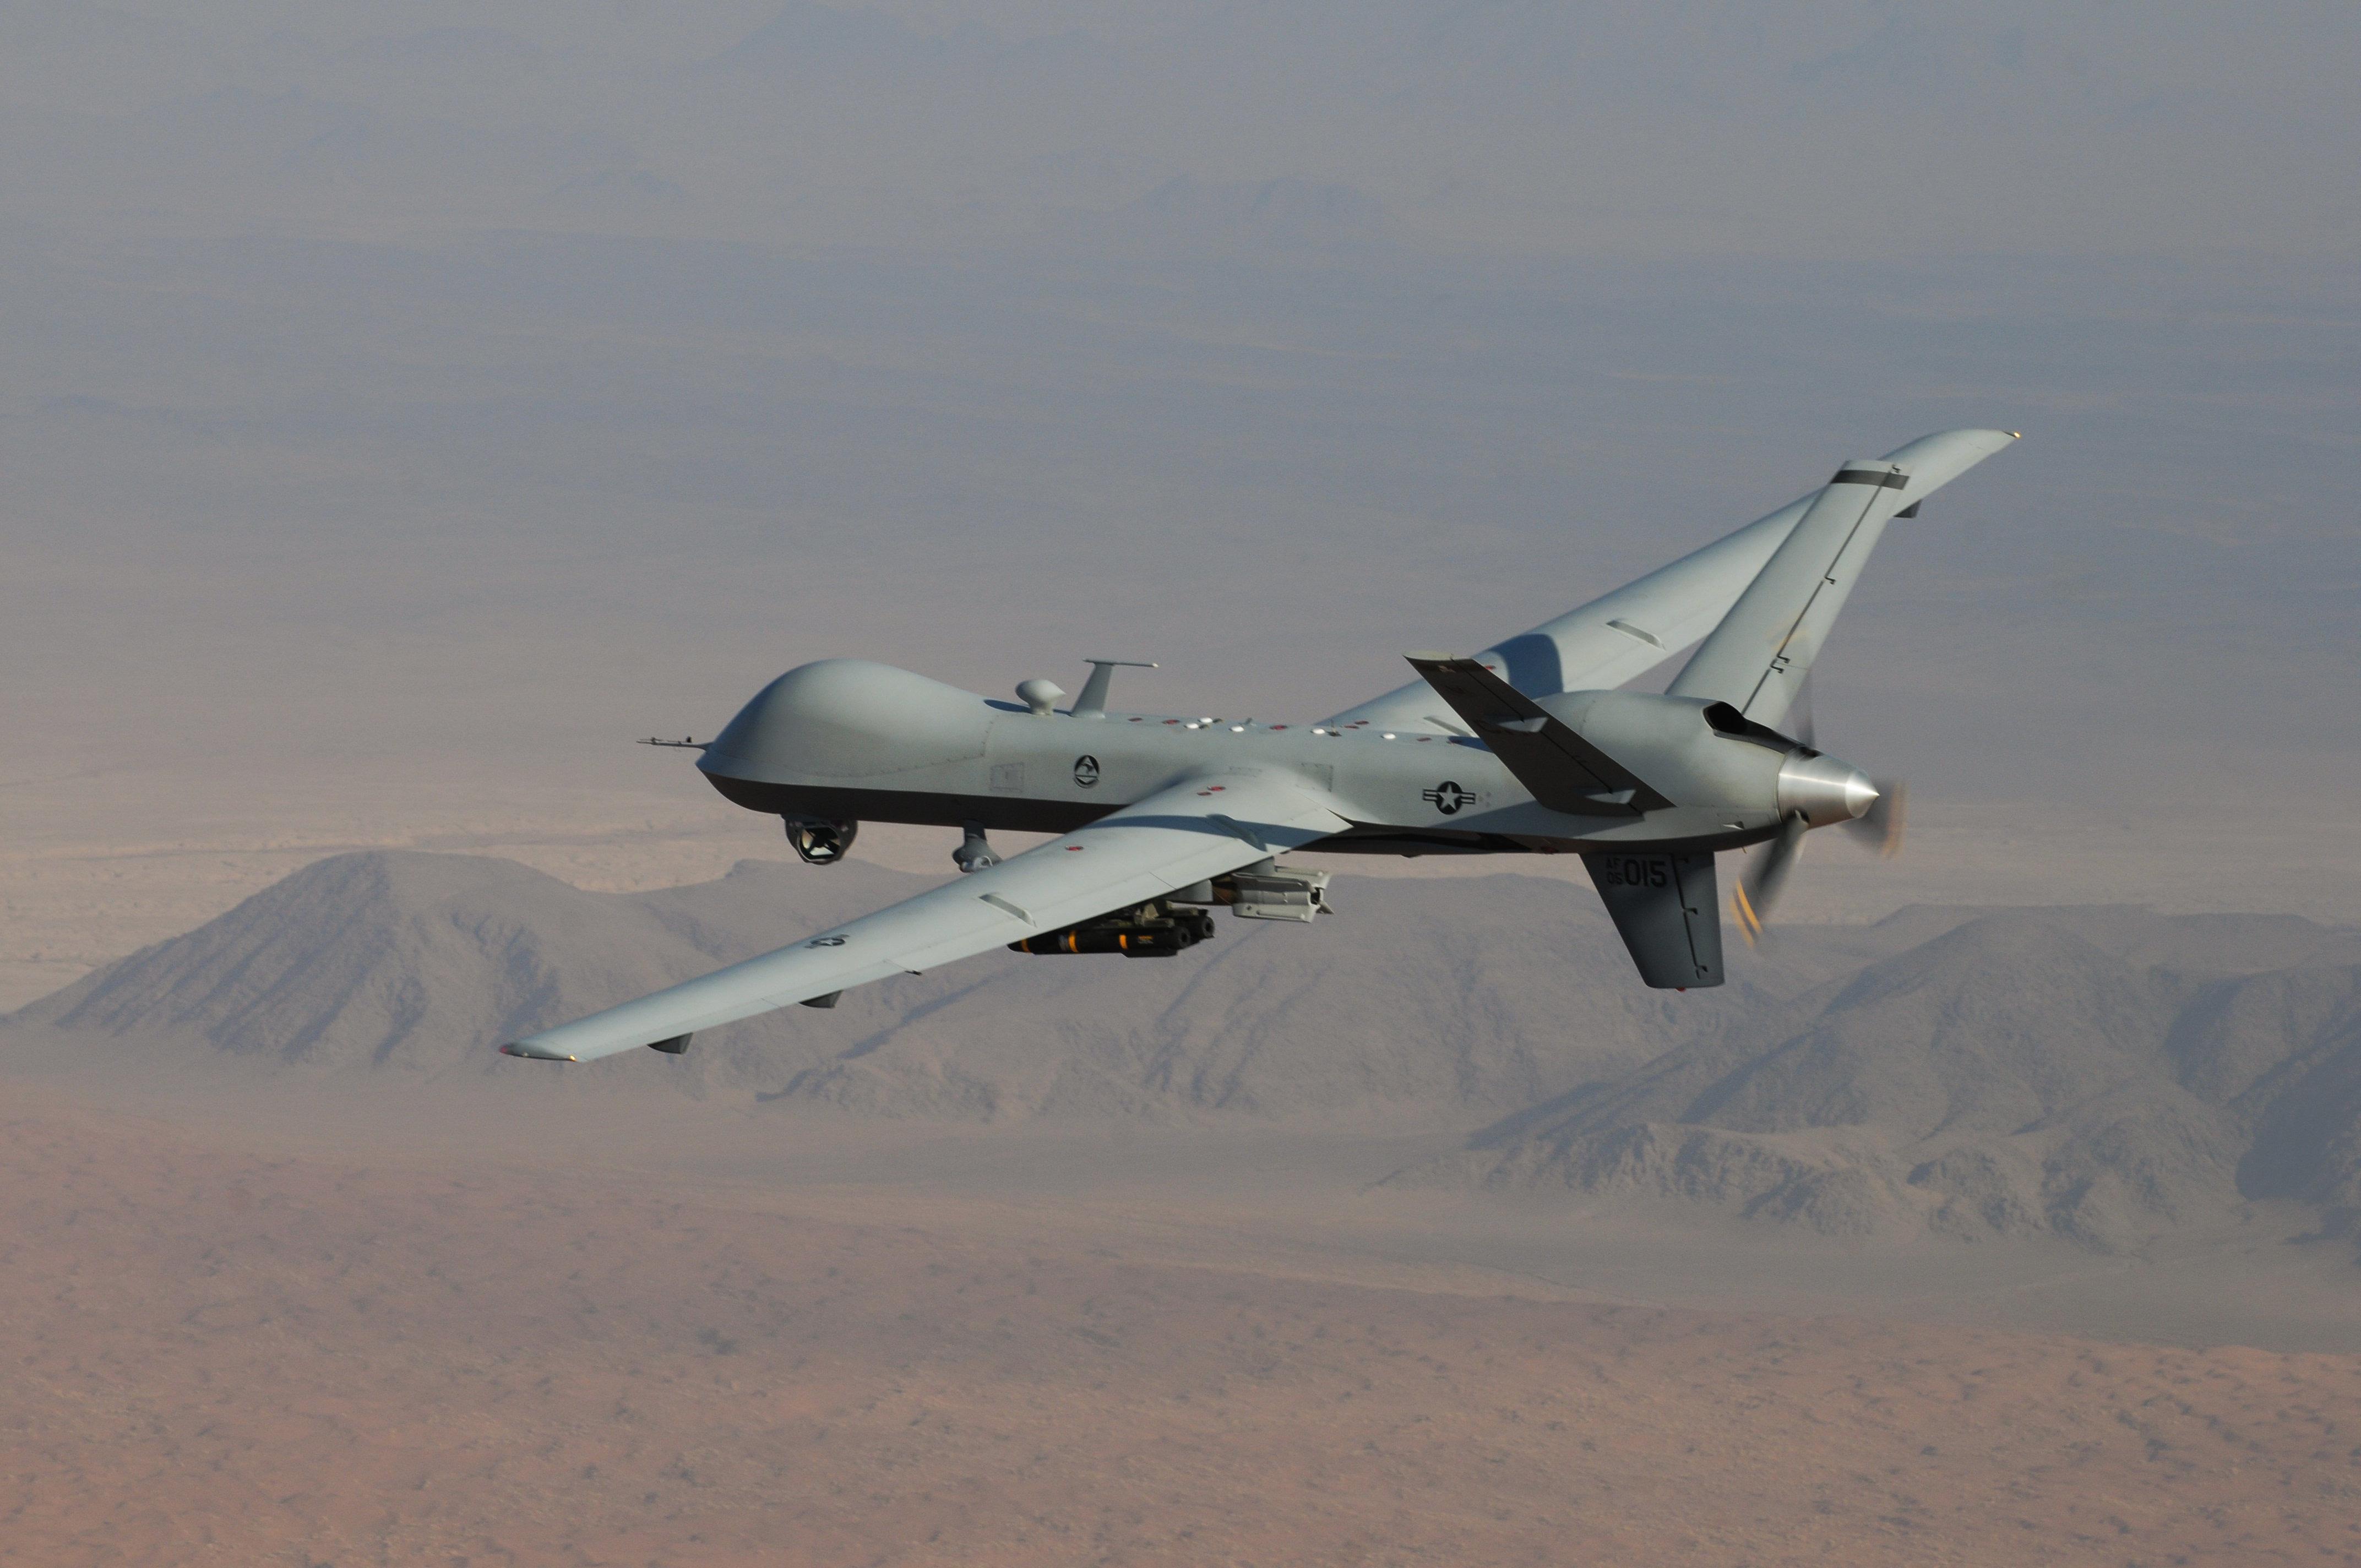 ��.�T_点评:歼-20隐身性能可与美国f-22\